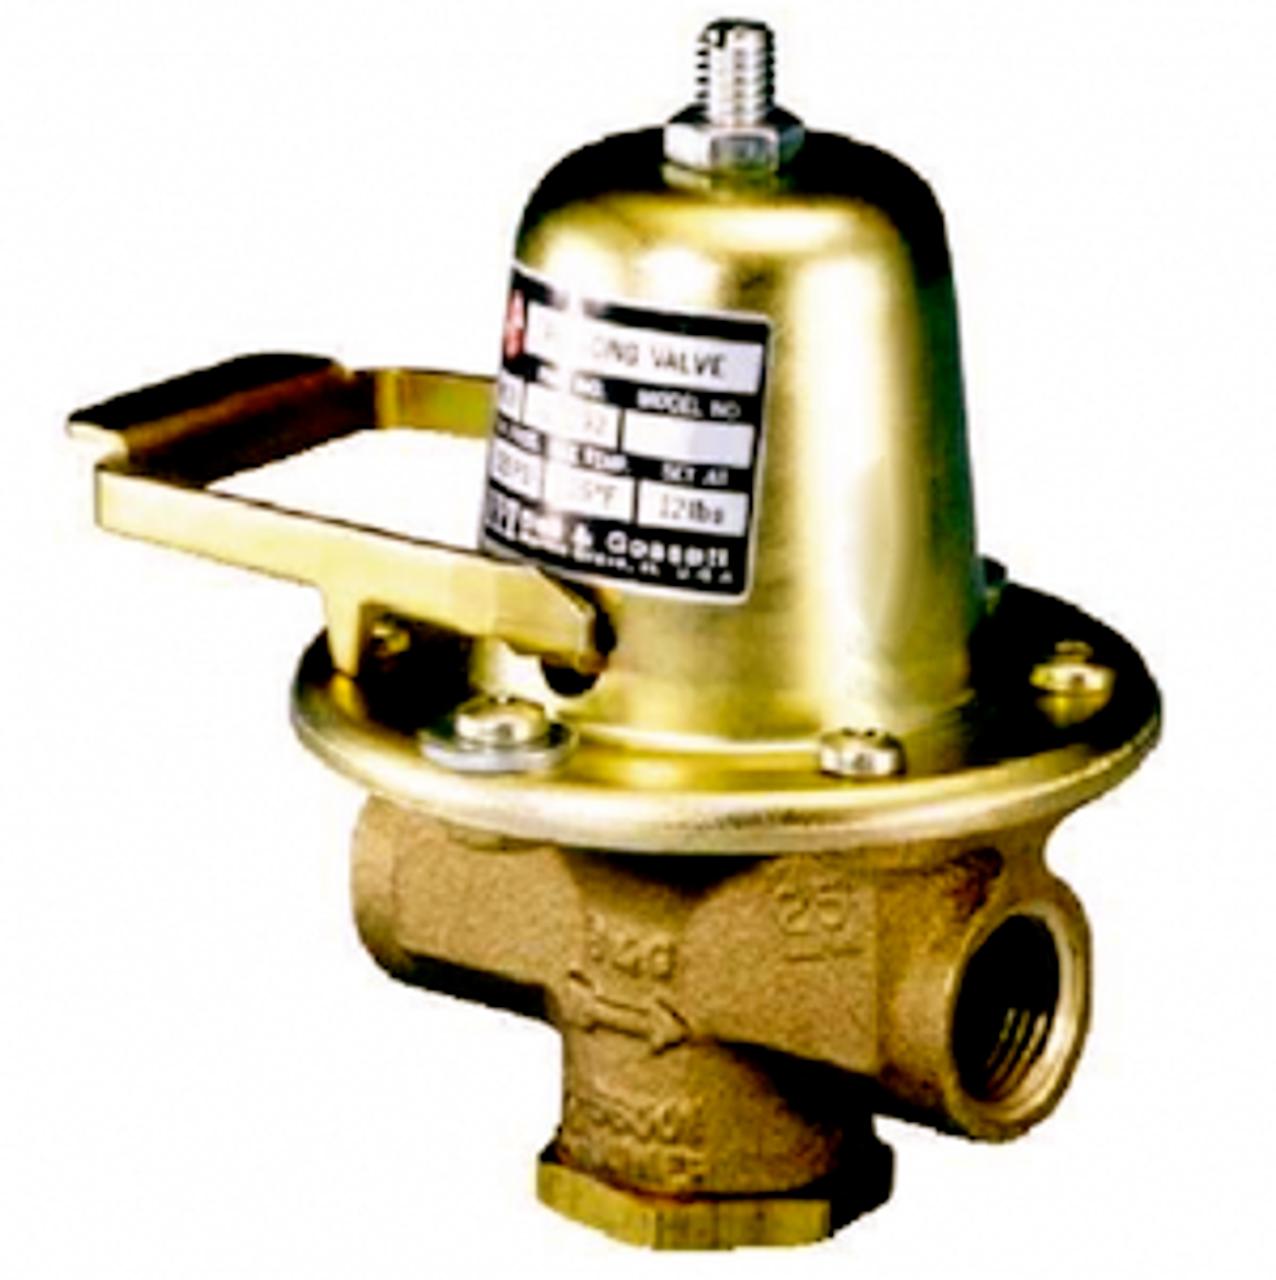 Bell /& Gossett B-38 Lead Free Pressure Reducing Valve Brass 1//2 Npt Connection